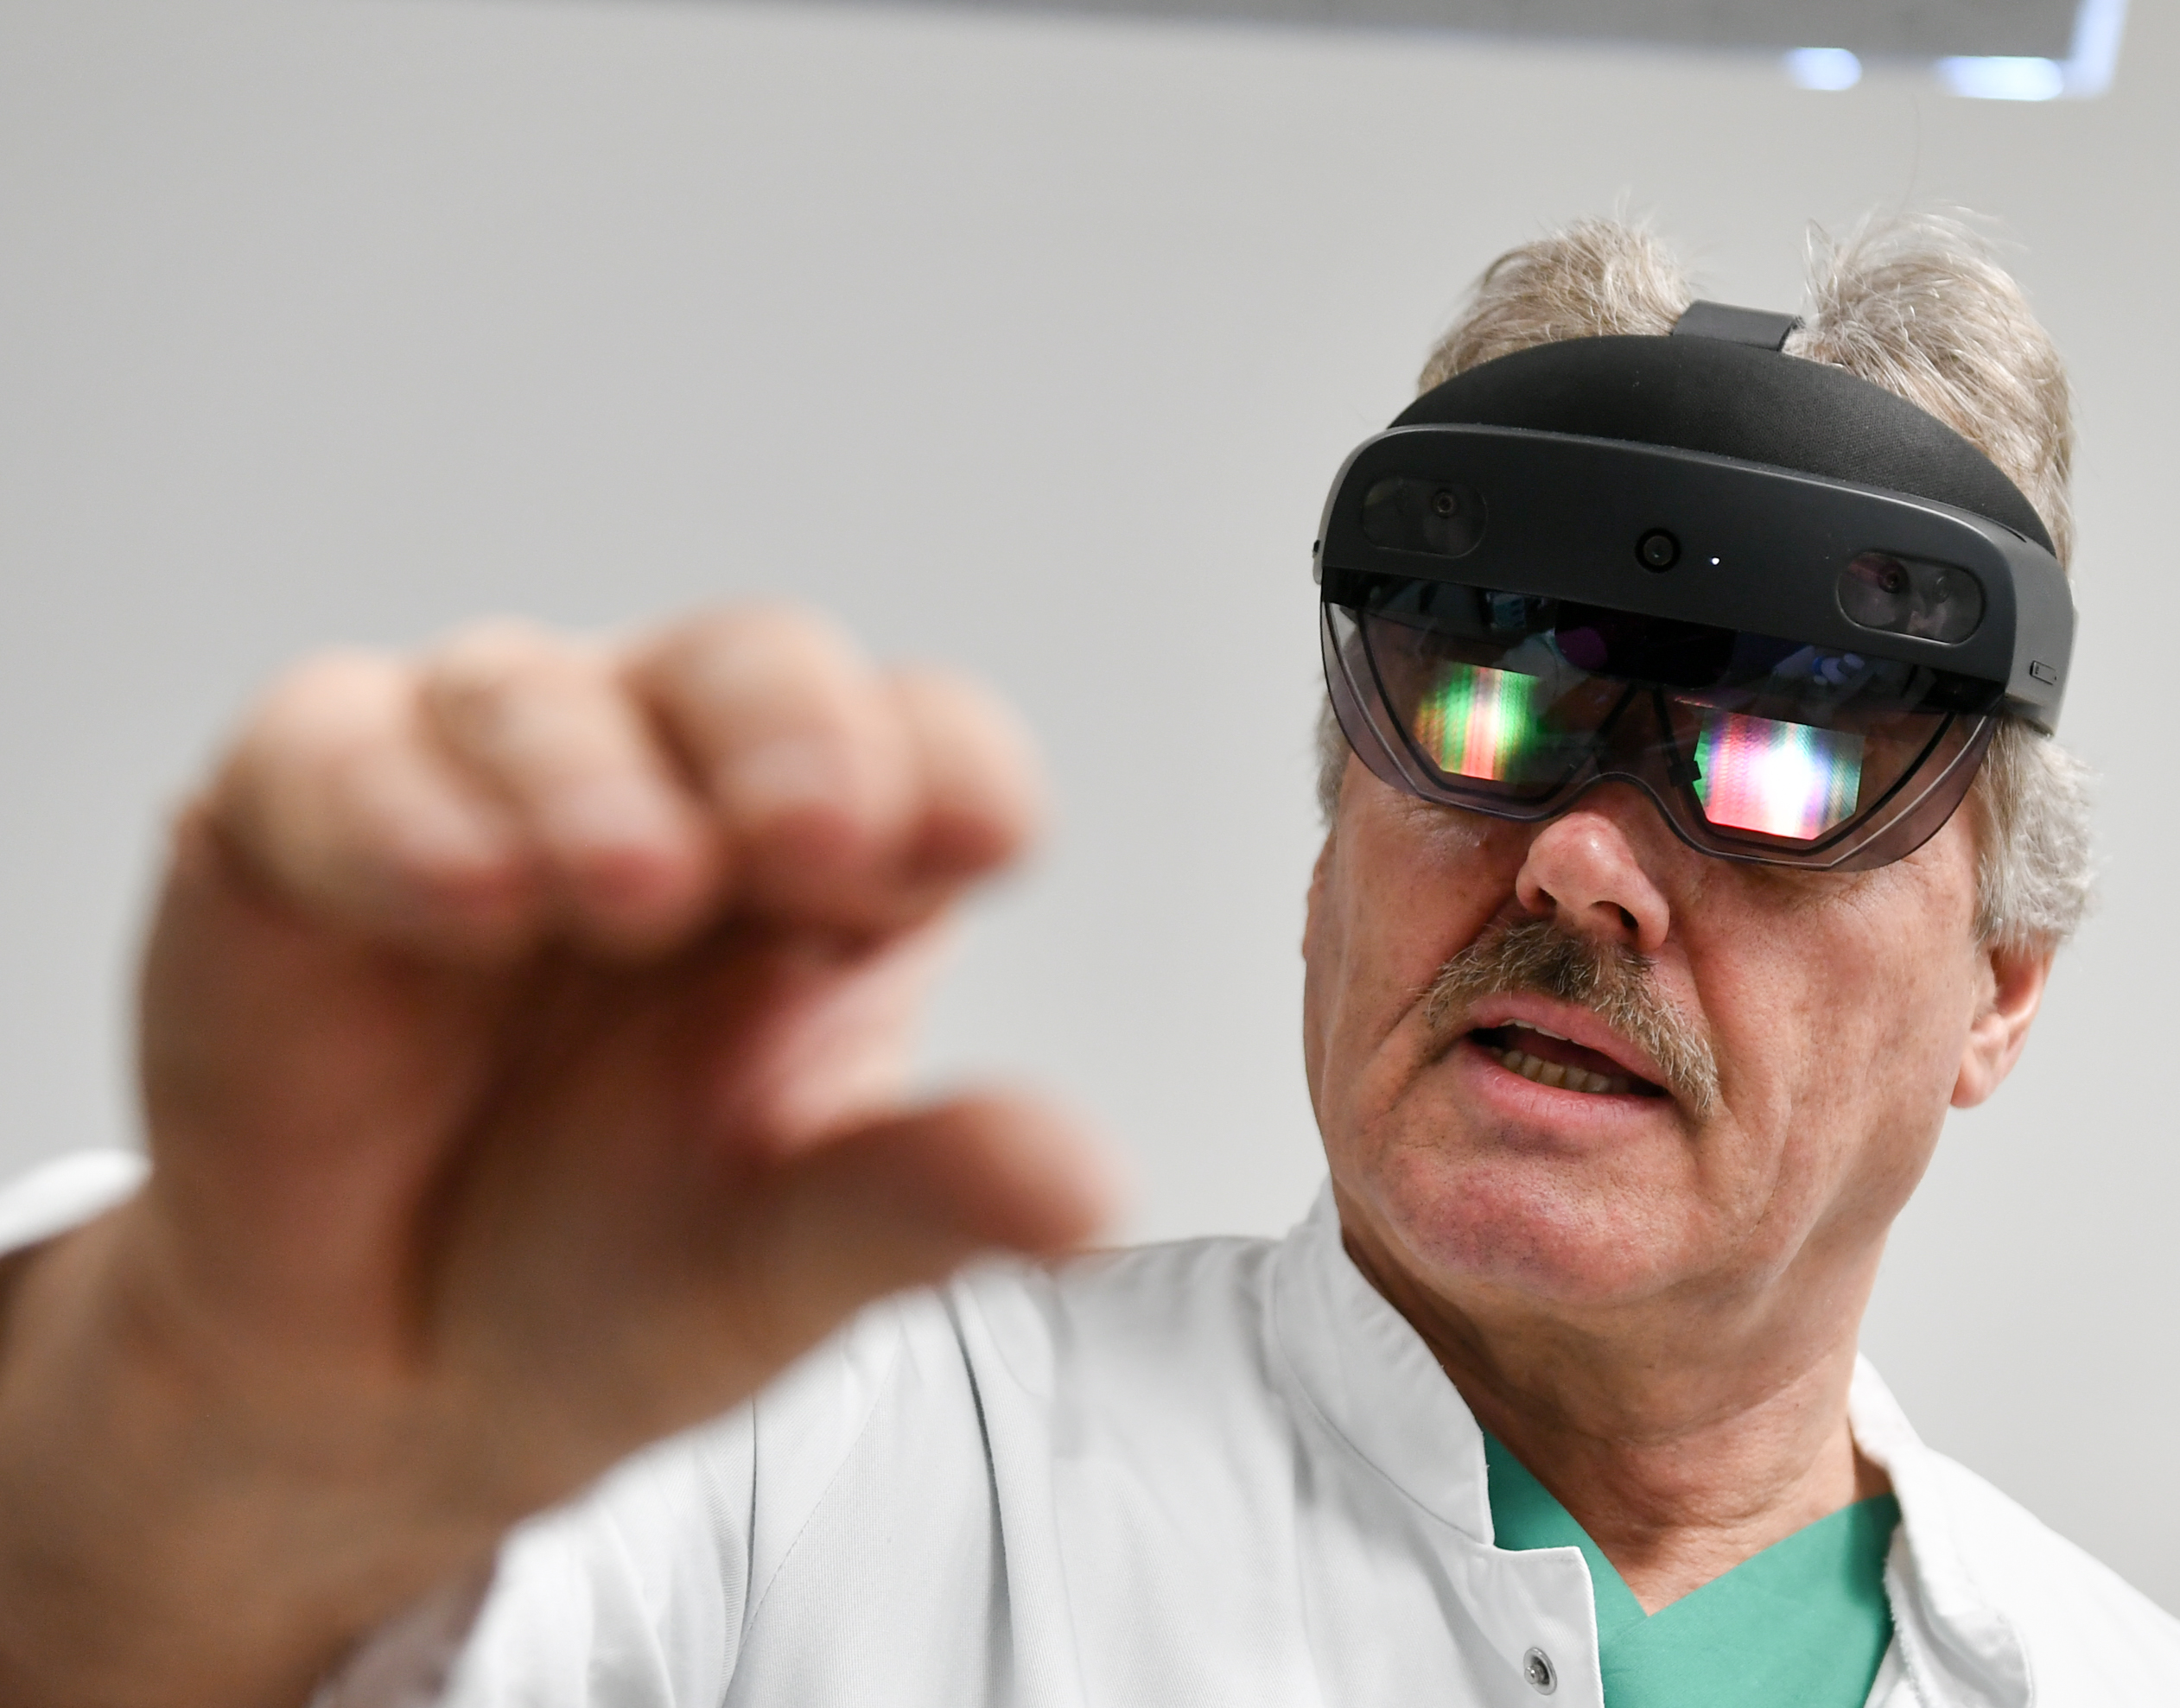 A man wearing a virtual reality headset reaches a hand toward the viewer.